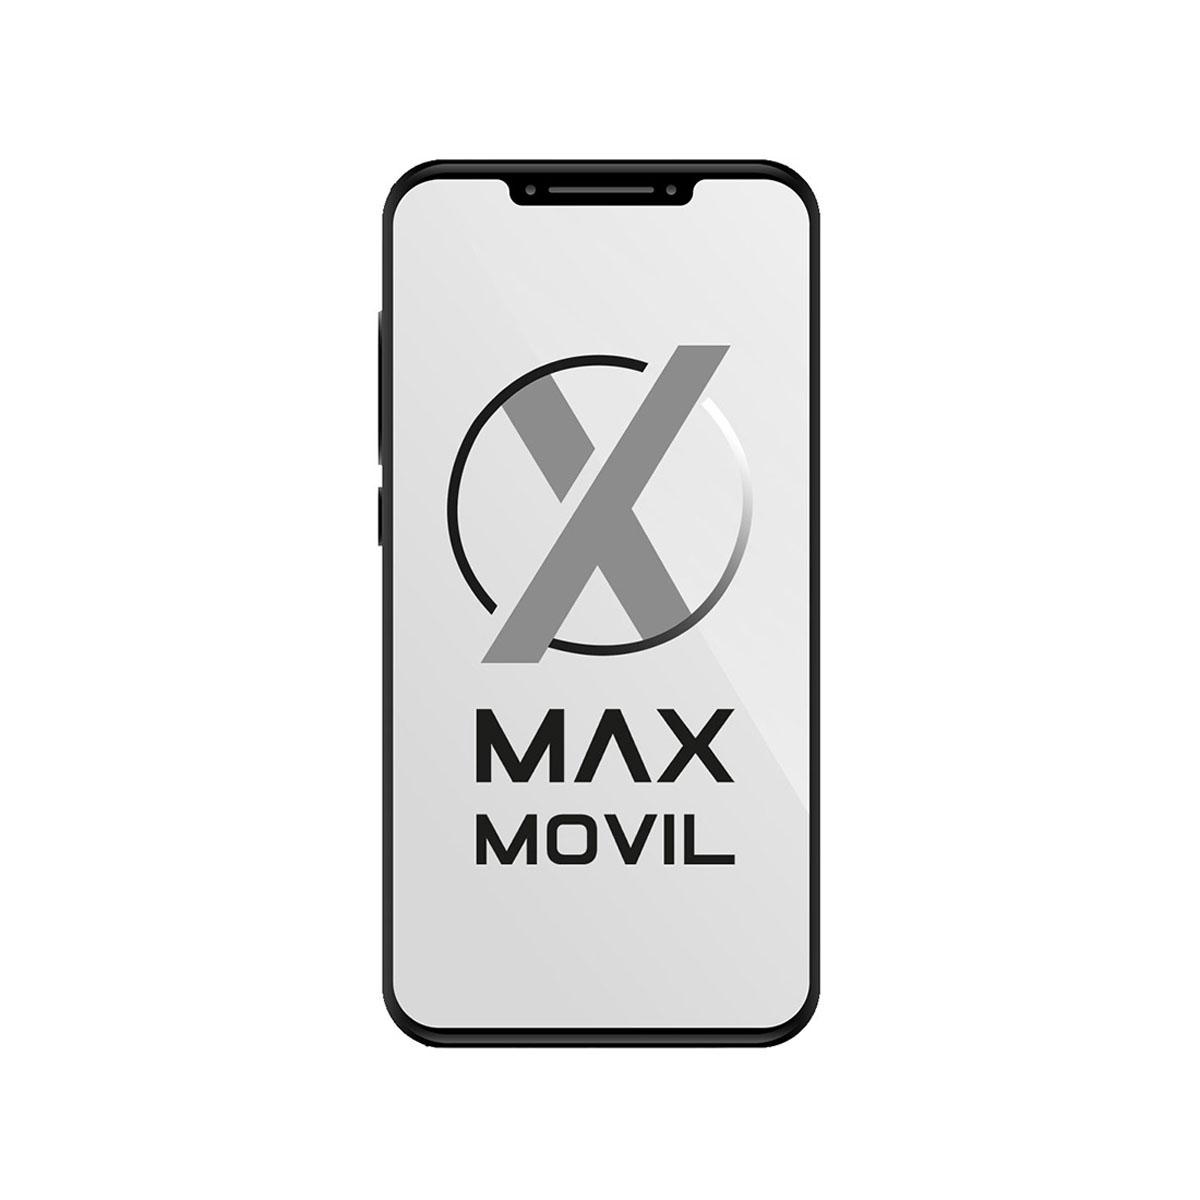 Adaptador a Corriente 85W MagSafe 2 para MacBook Pro 2012 MD506Z/A